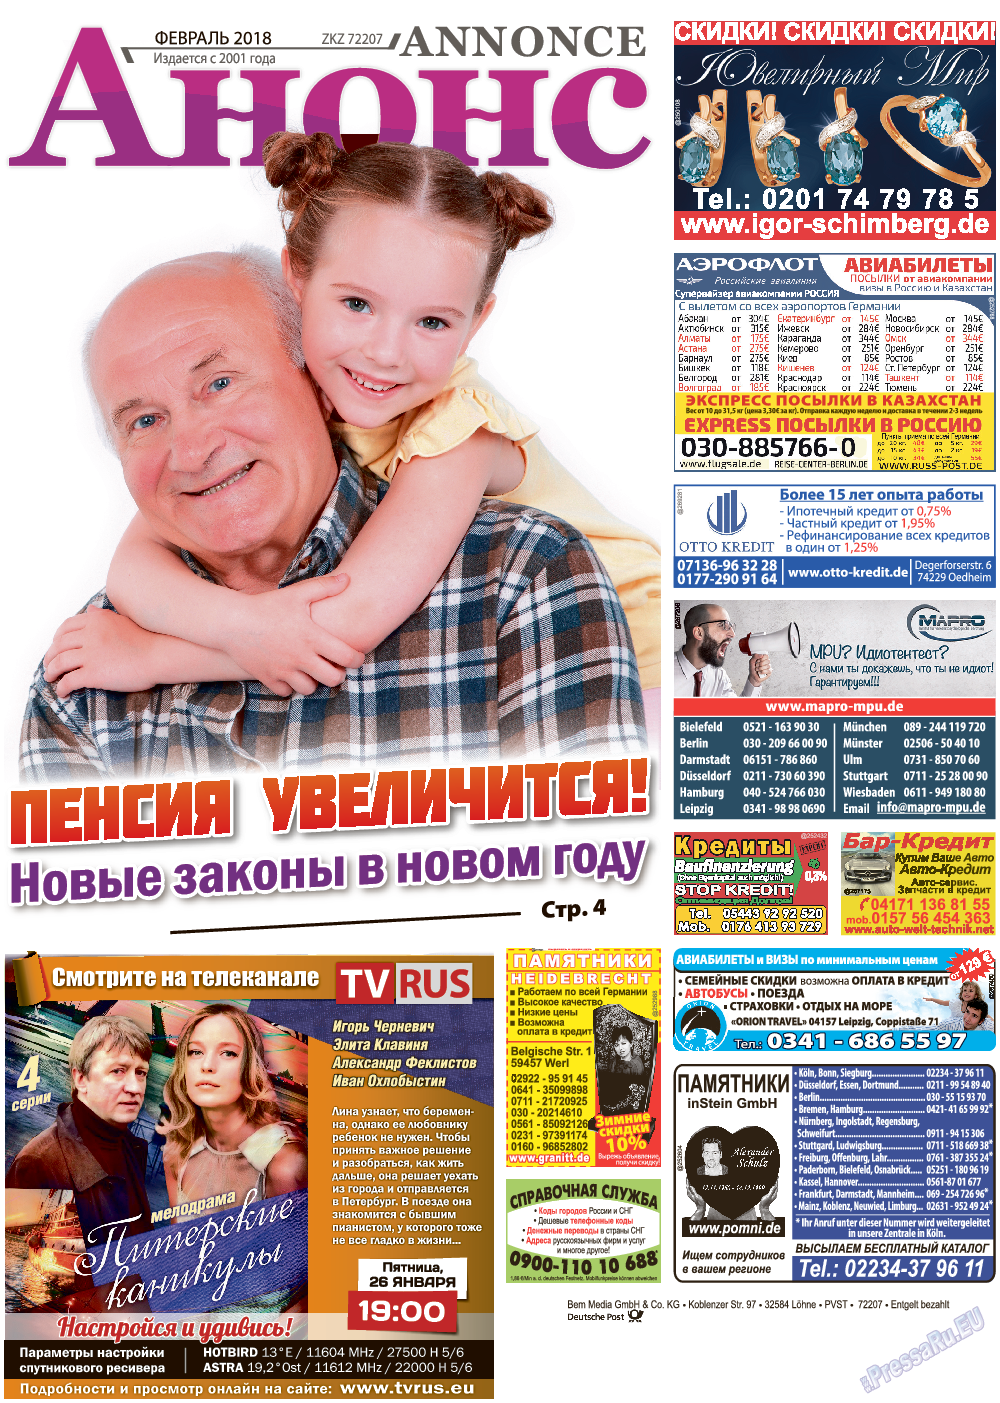 Анонс (газета). 2018 год, номер 2, стр. 1